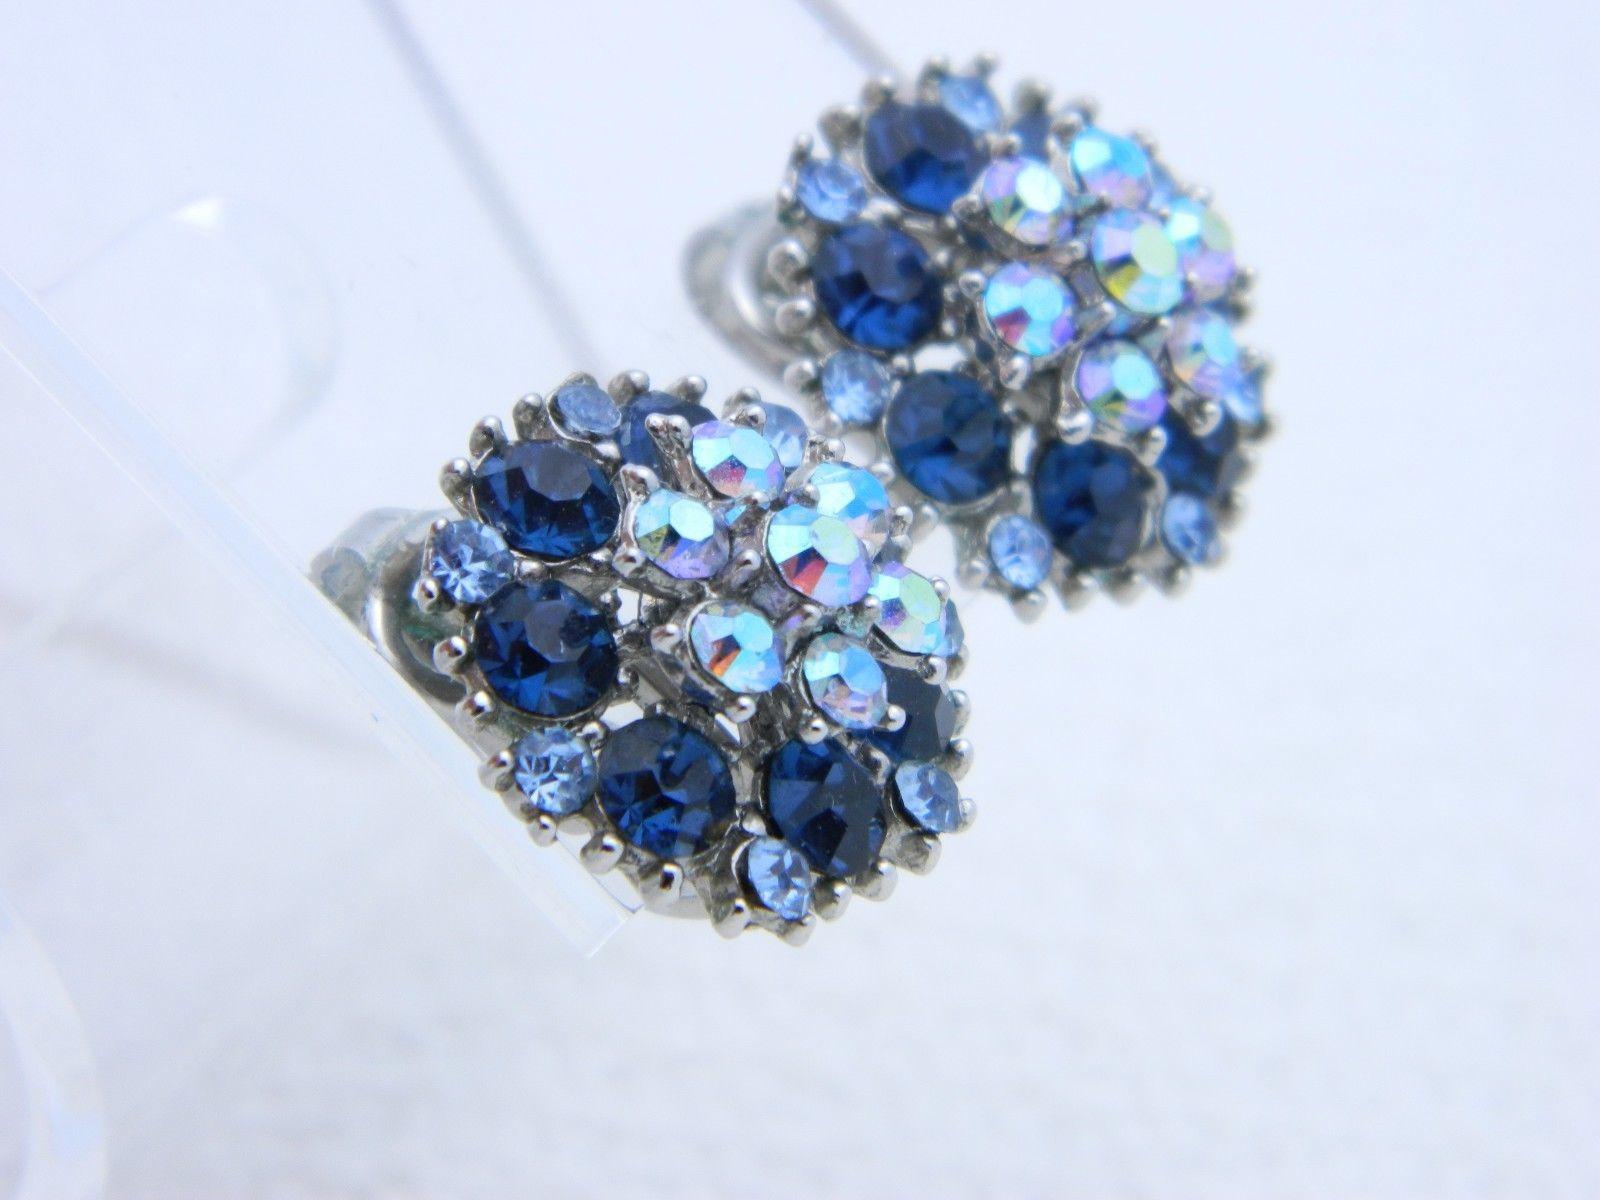 VTG CROWN TRIFARI Silver Tone Blue Rhinestone Flower Clip Earrings (B)